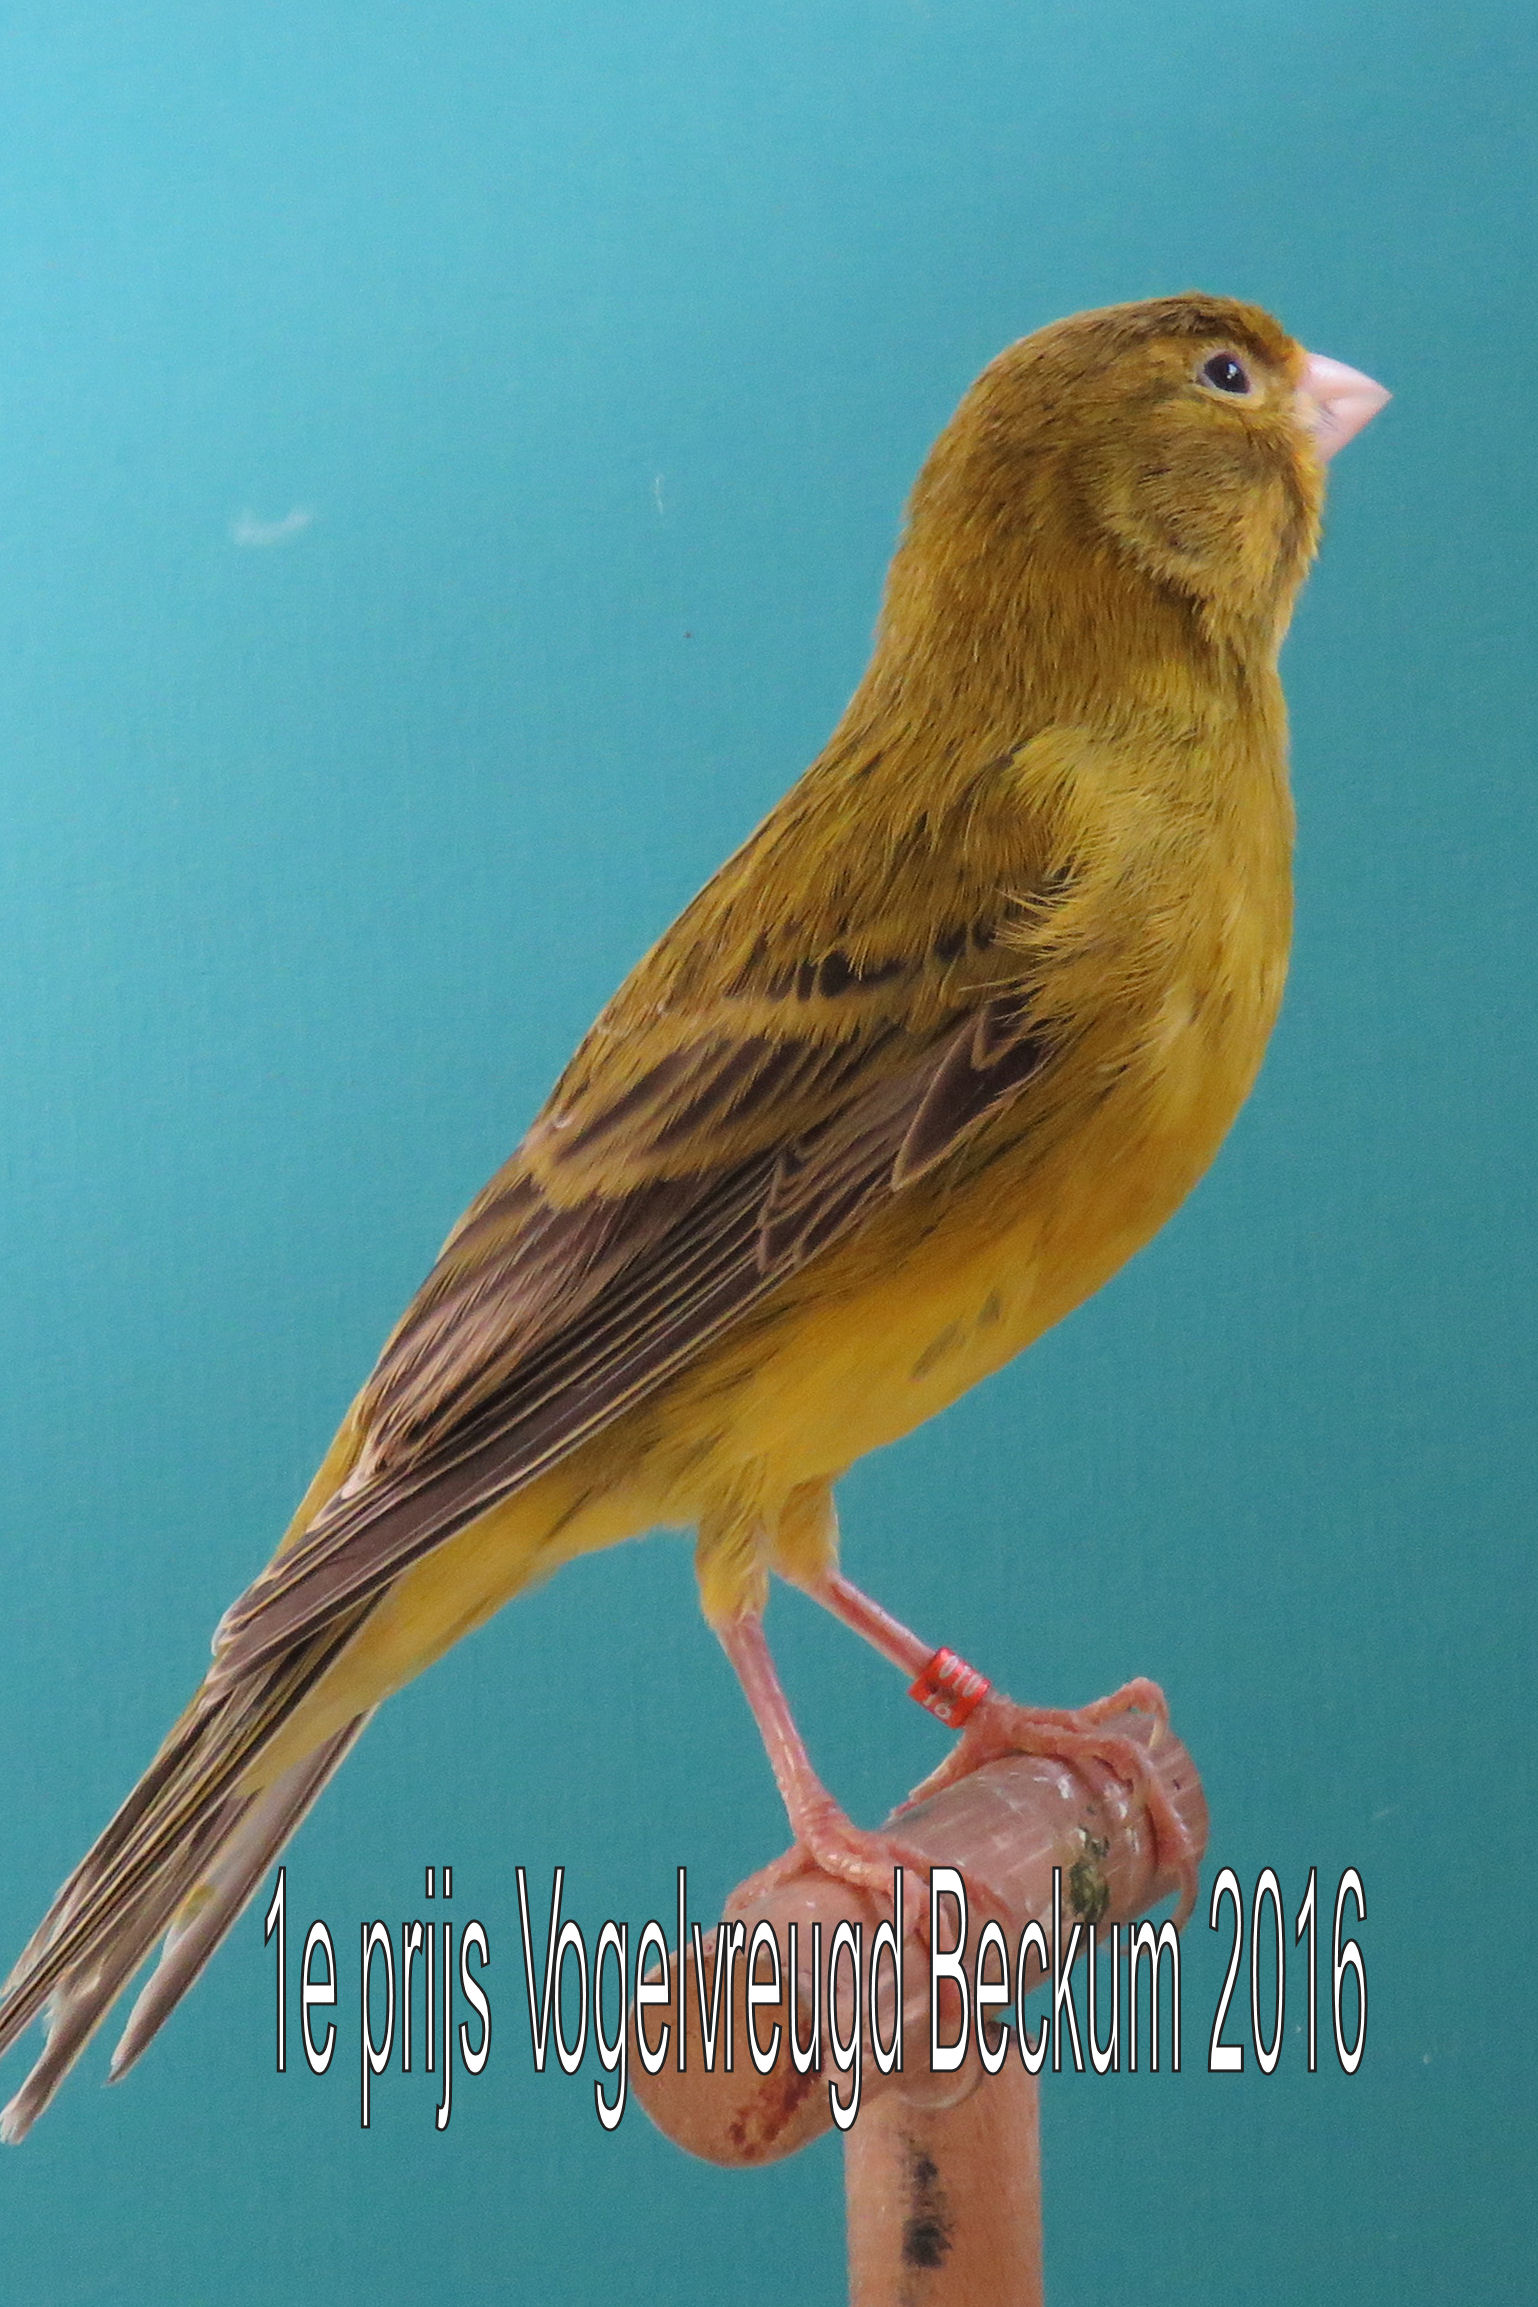 VogelvreugdBeckum2016 Olijf 1e